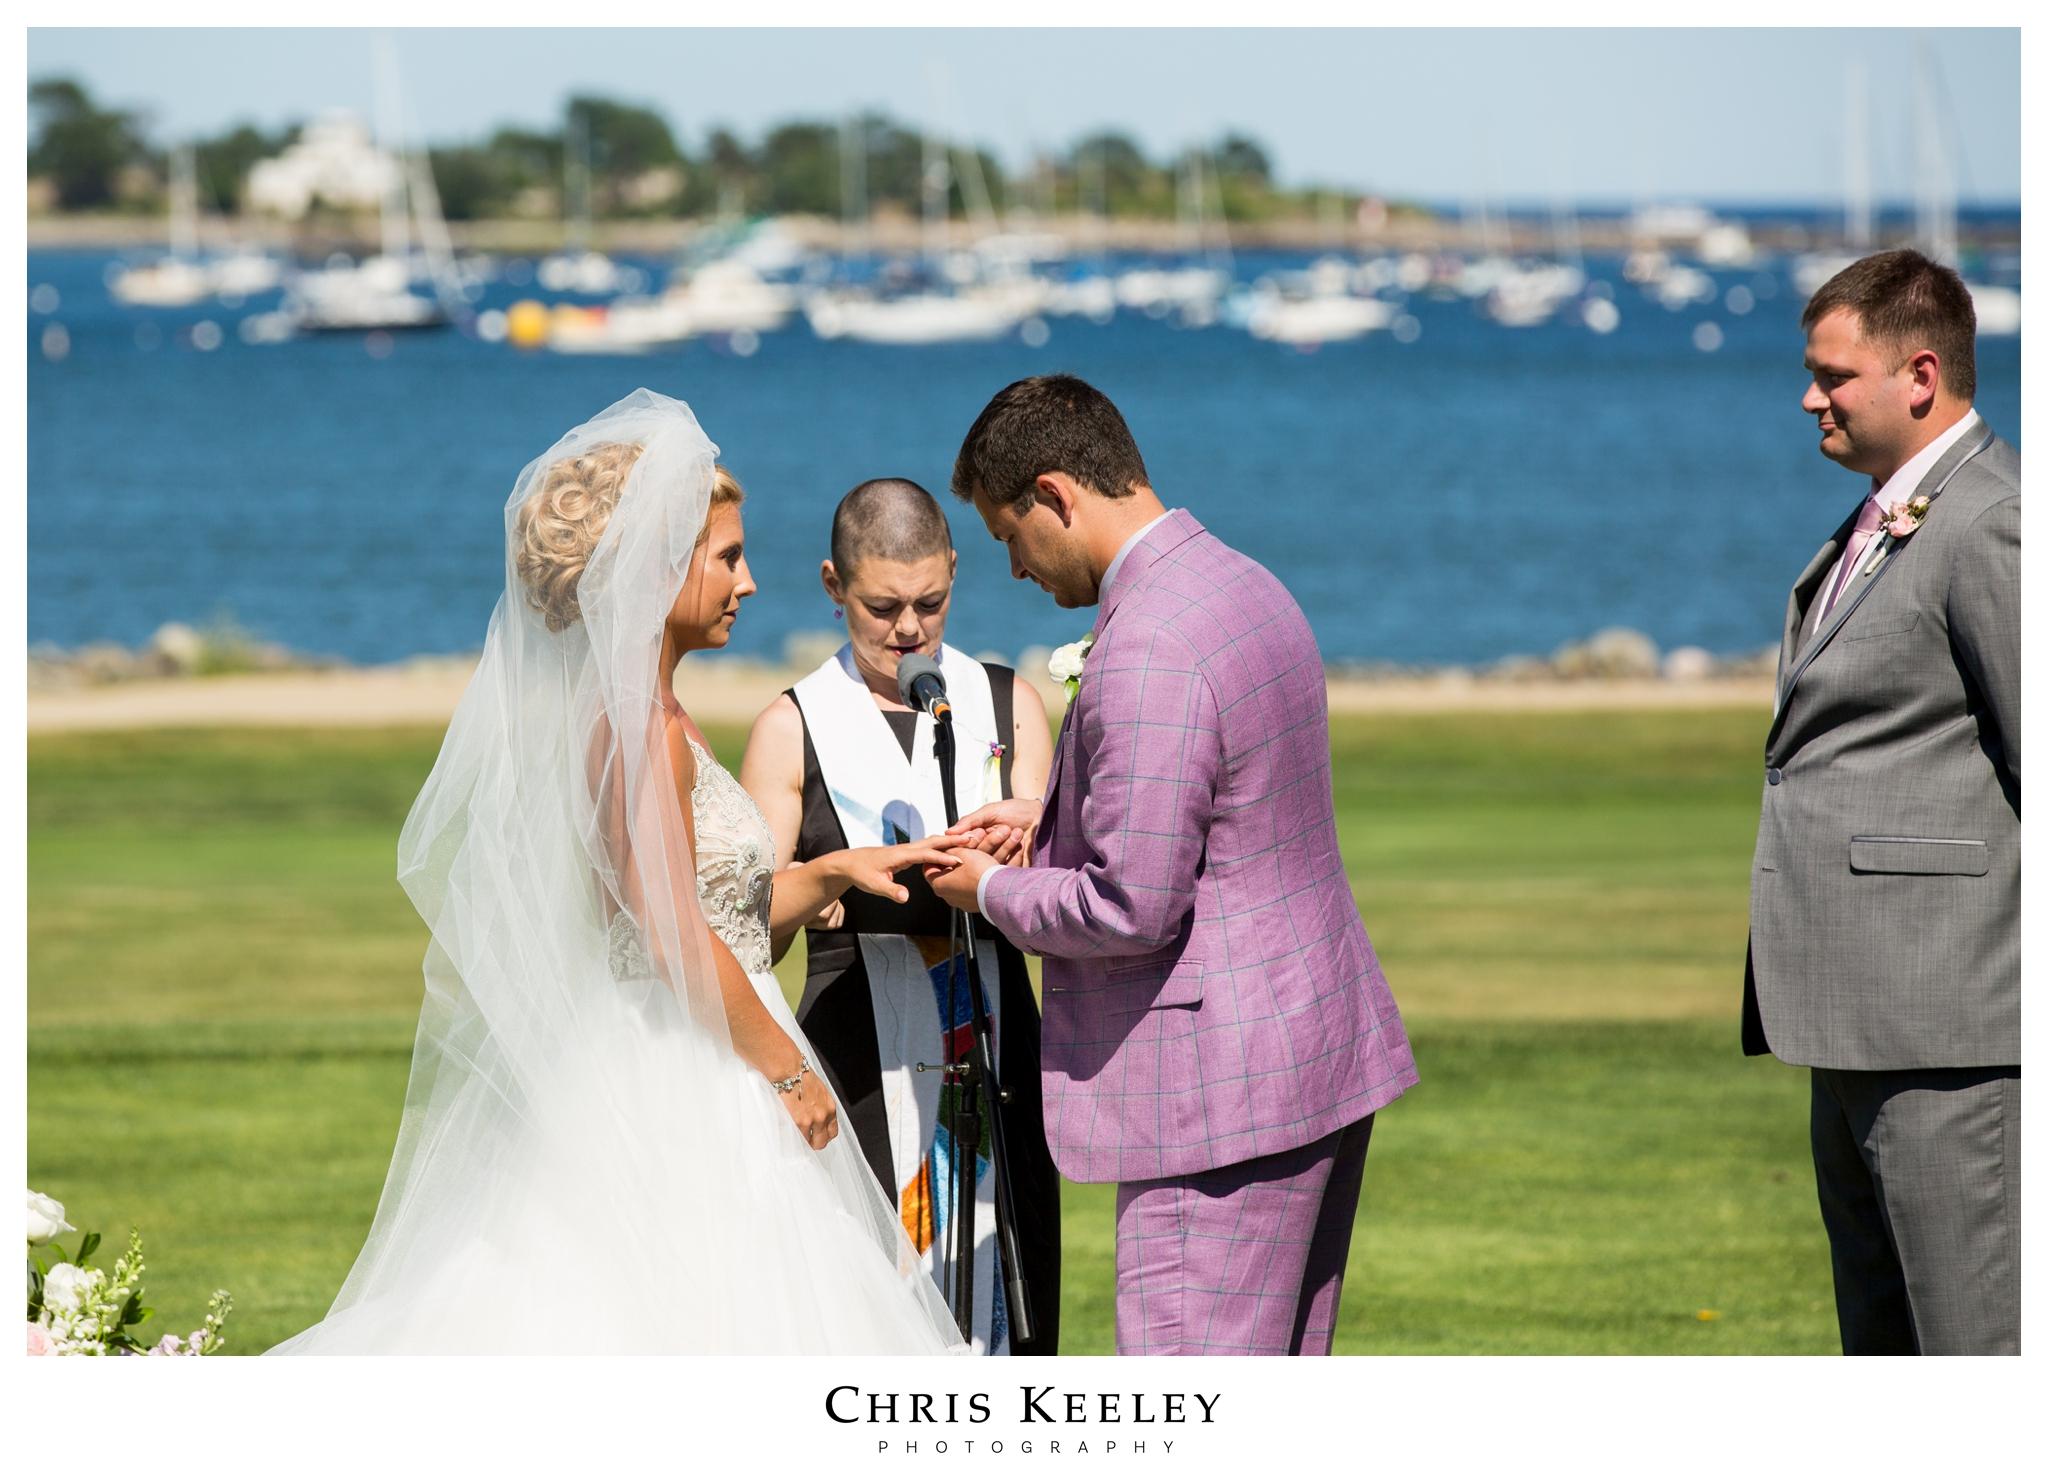 groom-putting-on-ring.jpg